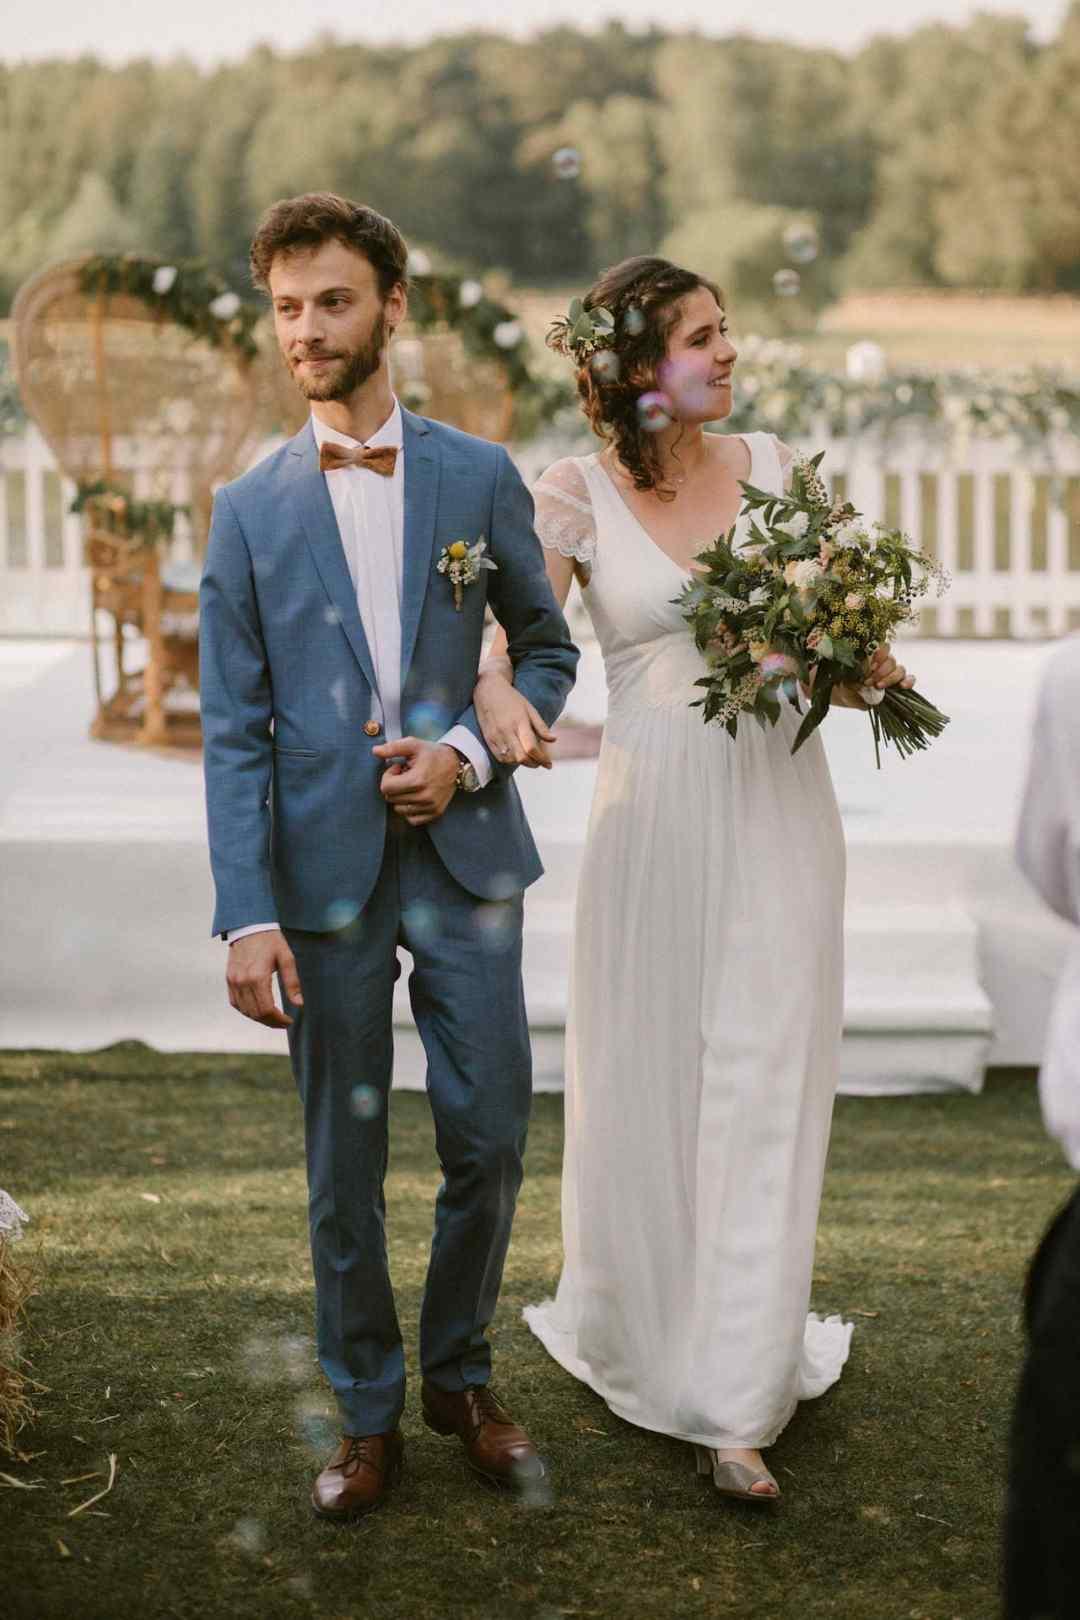 bouquet-mariee-boutonniere-vegetale-mariage